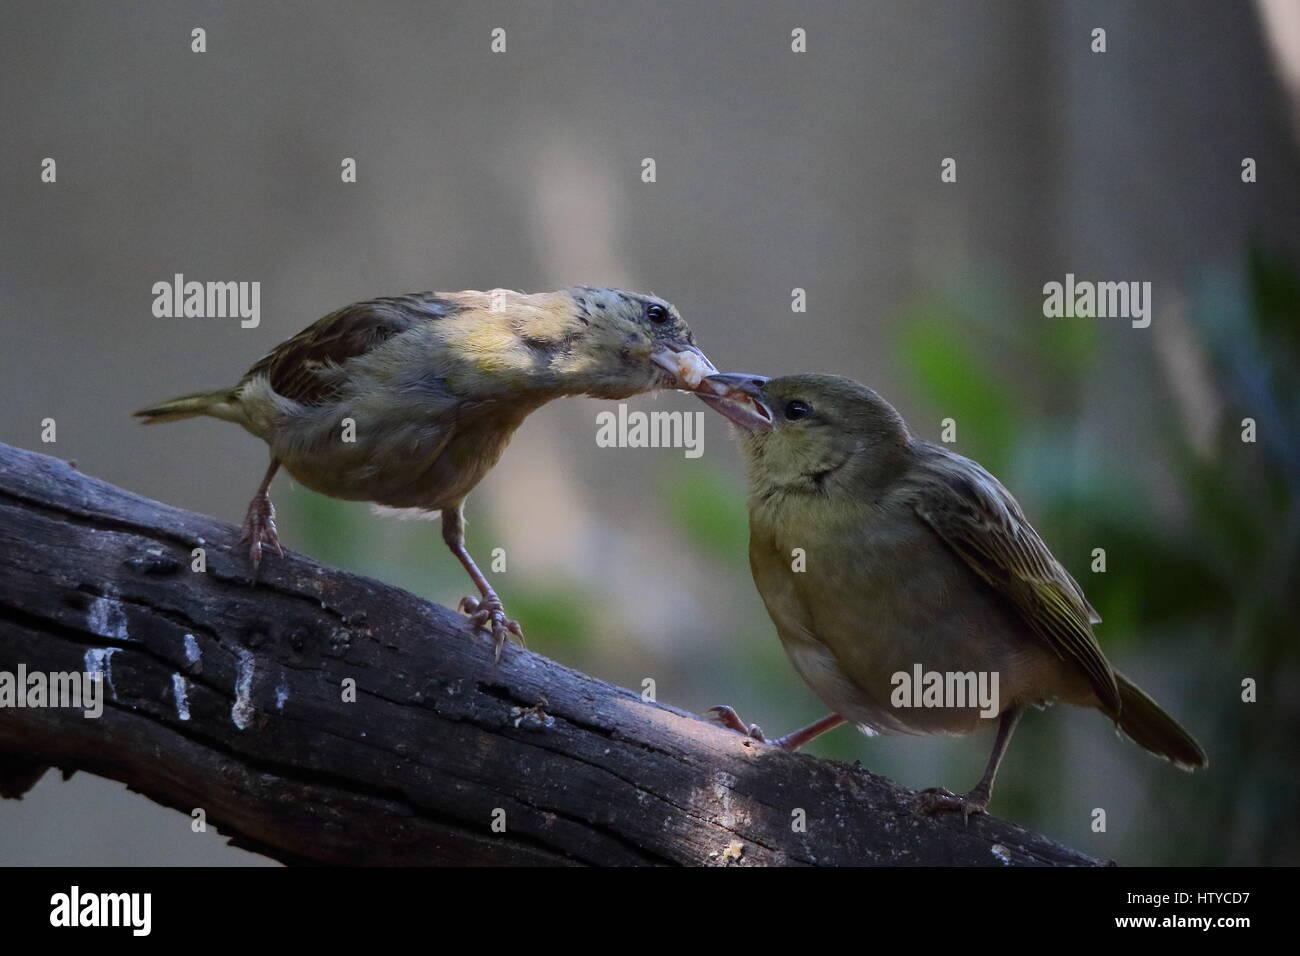 Motherhood - a female bird feeds its young - Stock Image